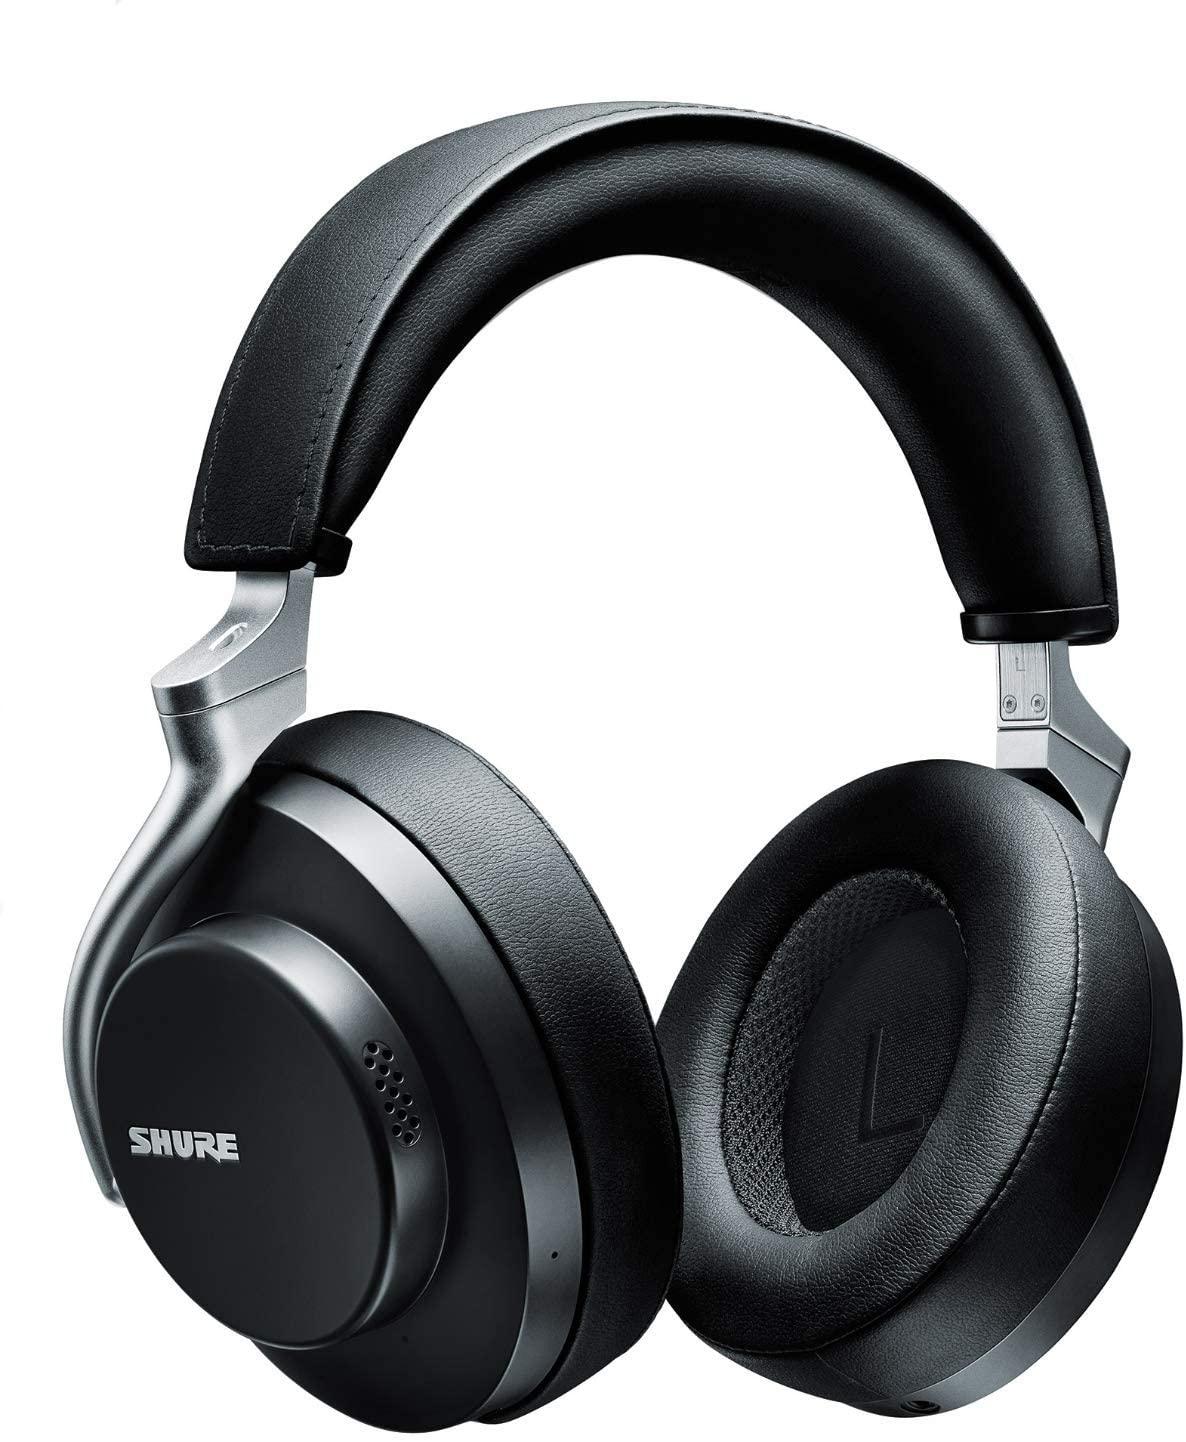 Shure AONIC 50 noise cancelling koptelefoon